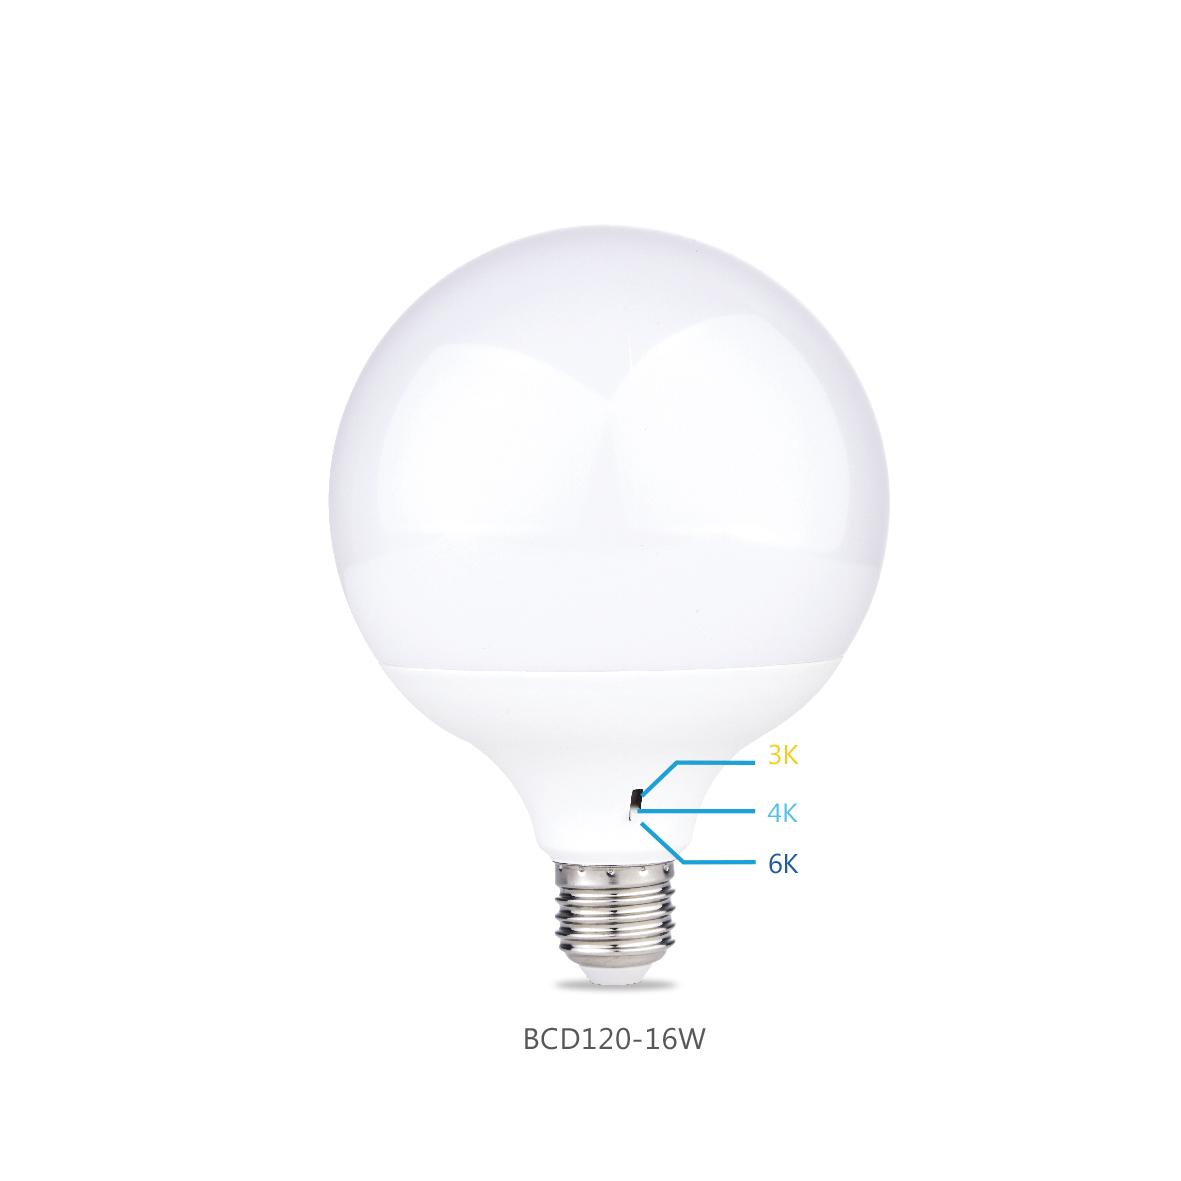 3CCT Patent Bulb BCD120-16W